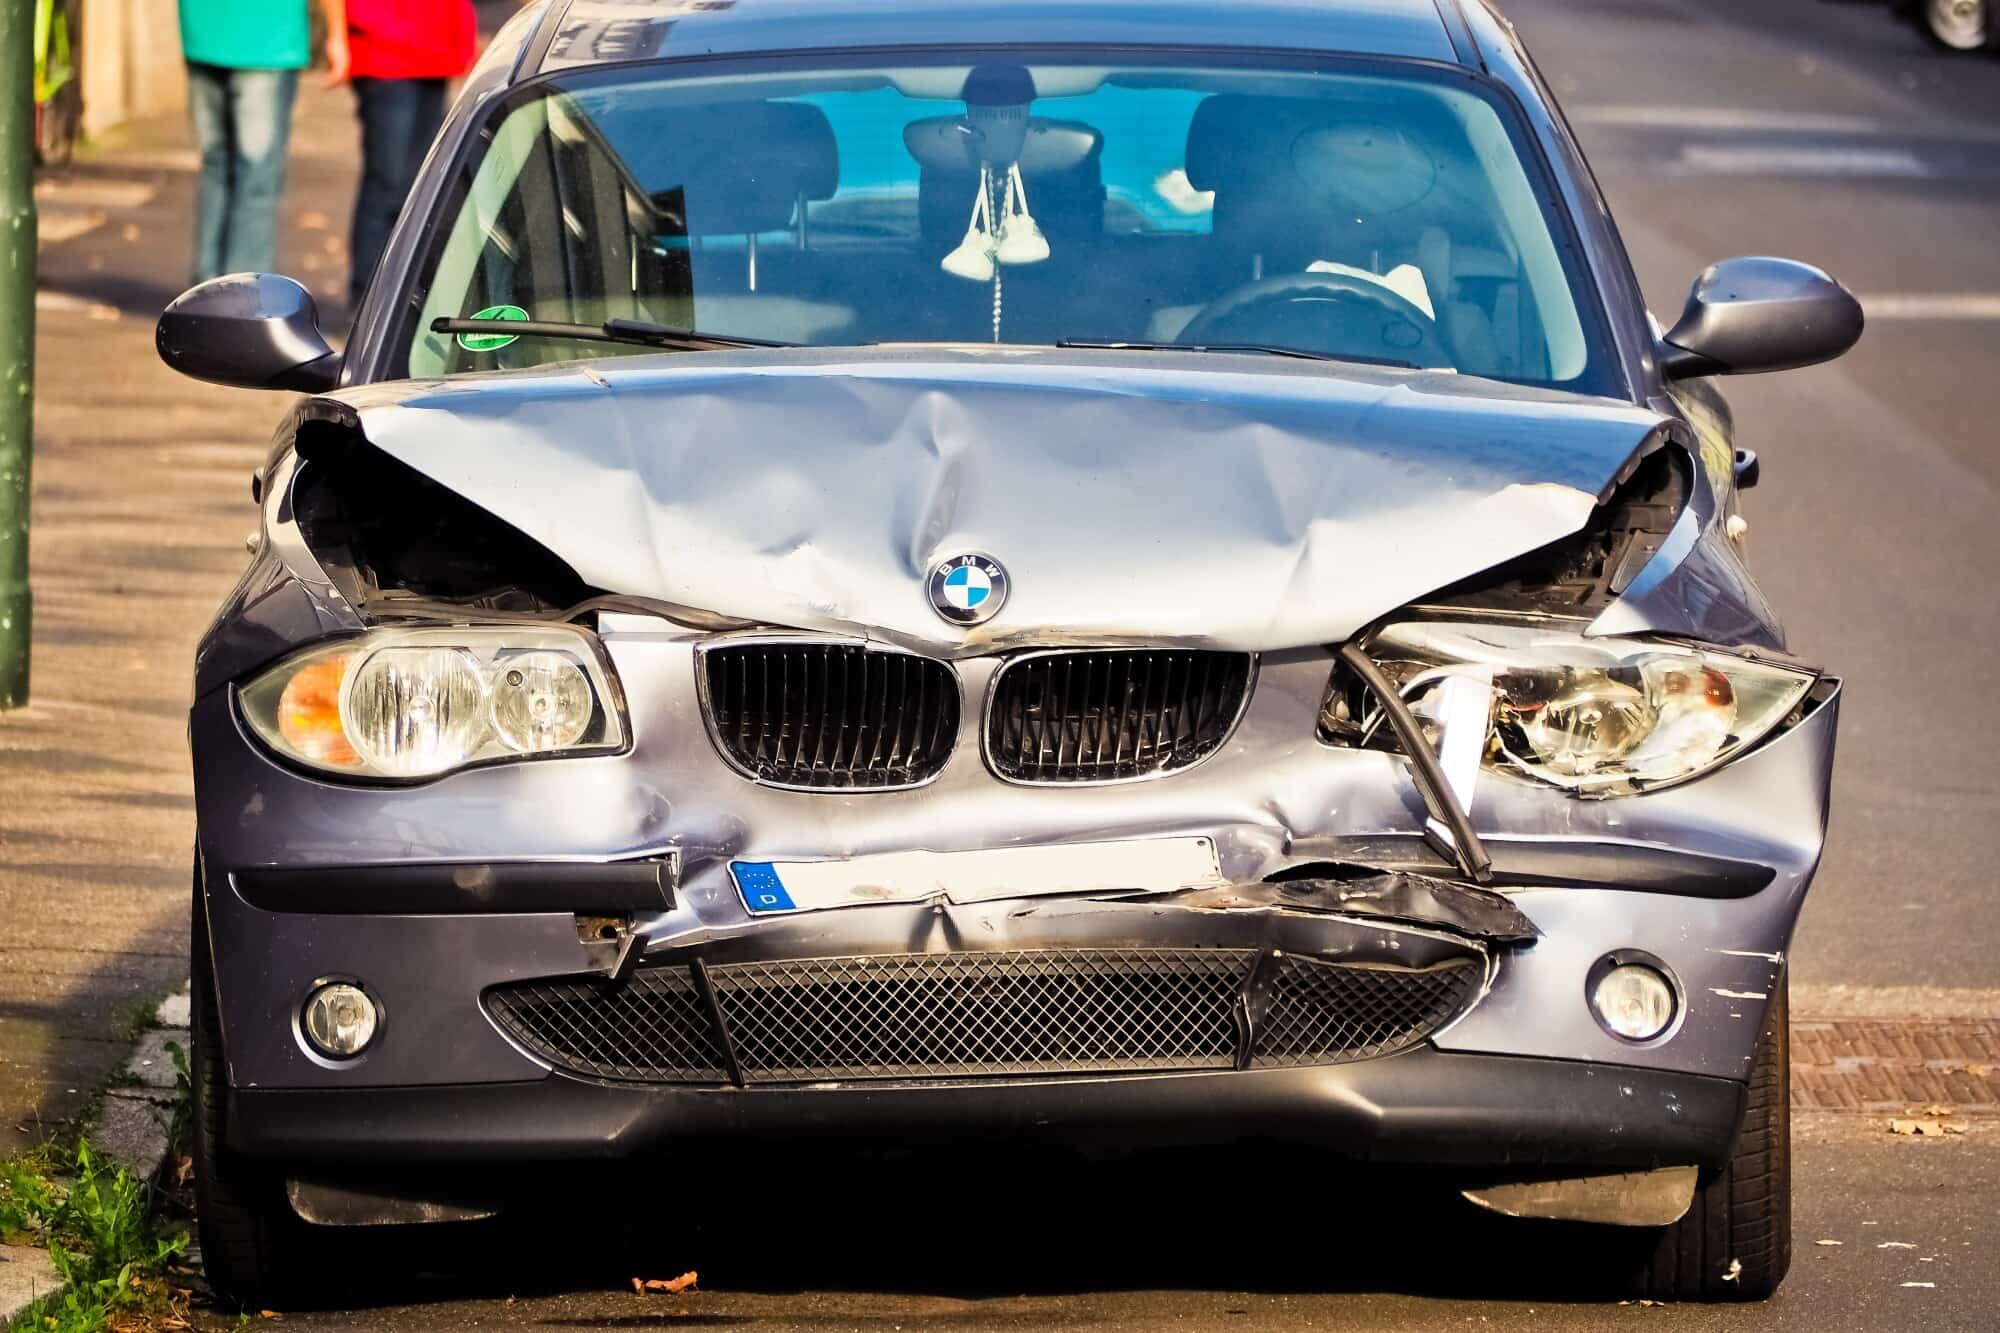 3 People Killed on Car Crash on Sitkum-Solduc Road [Clallam County, WA]